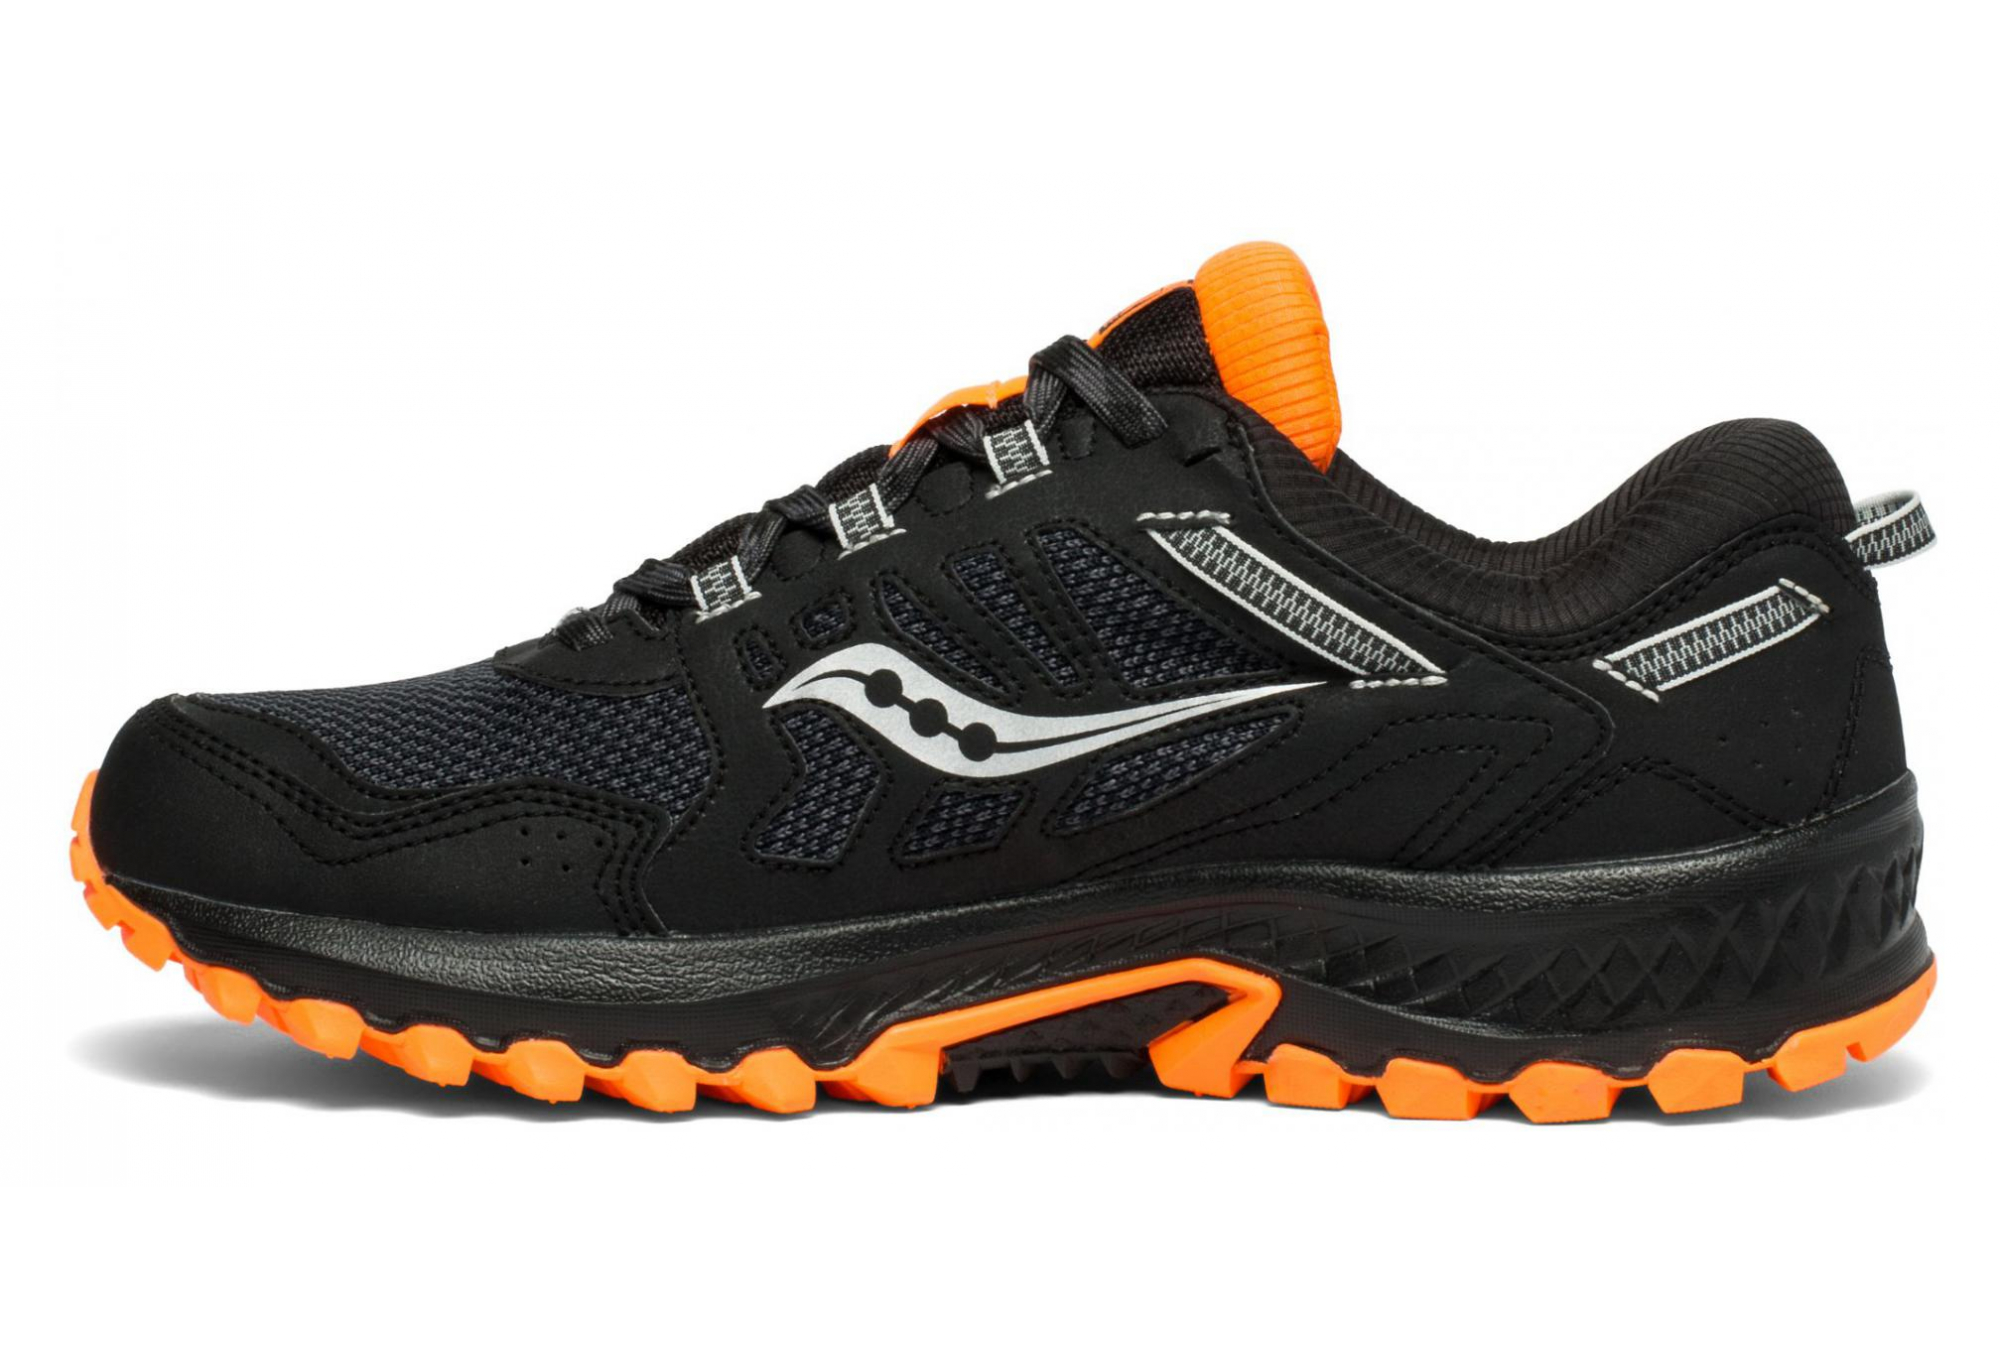 Saucony EXCURSION TR13 GTX Black Orange